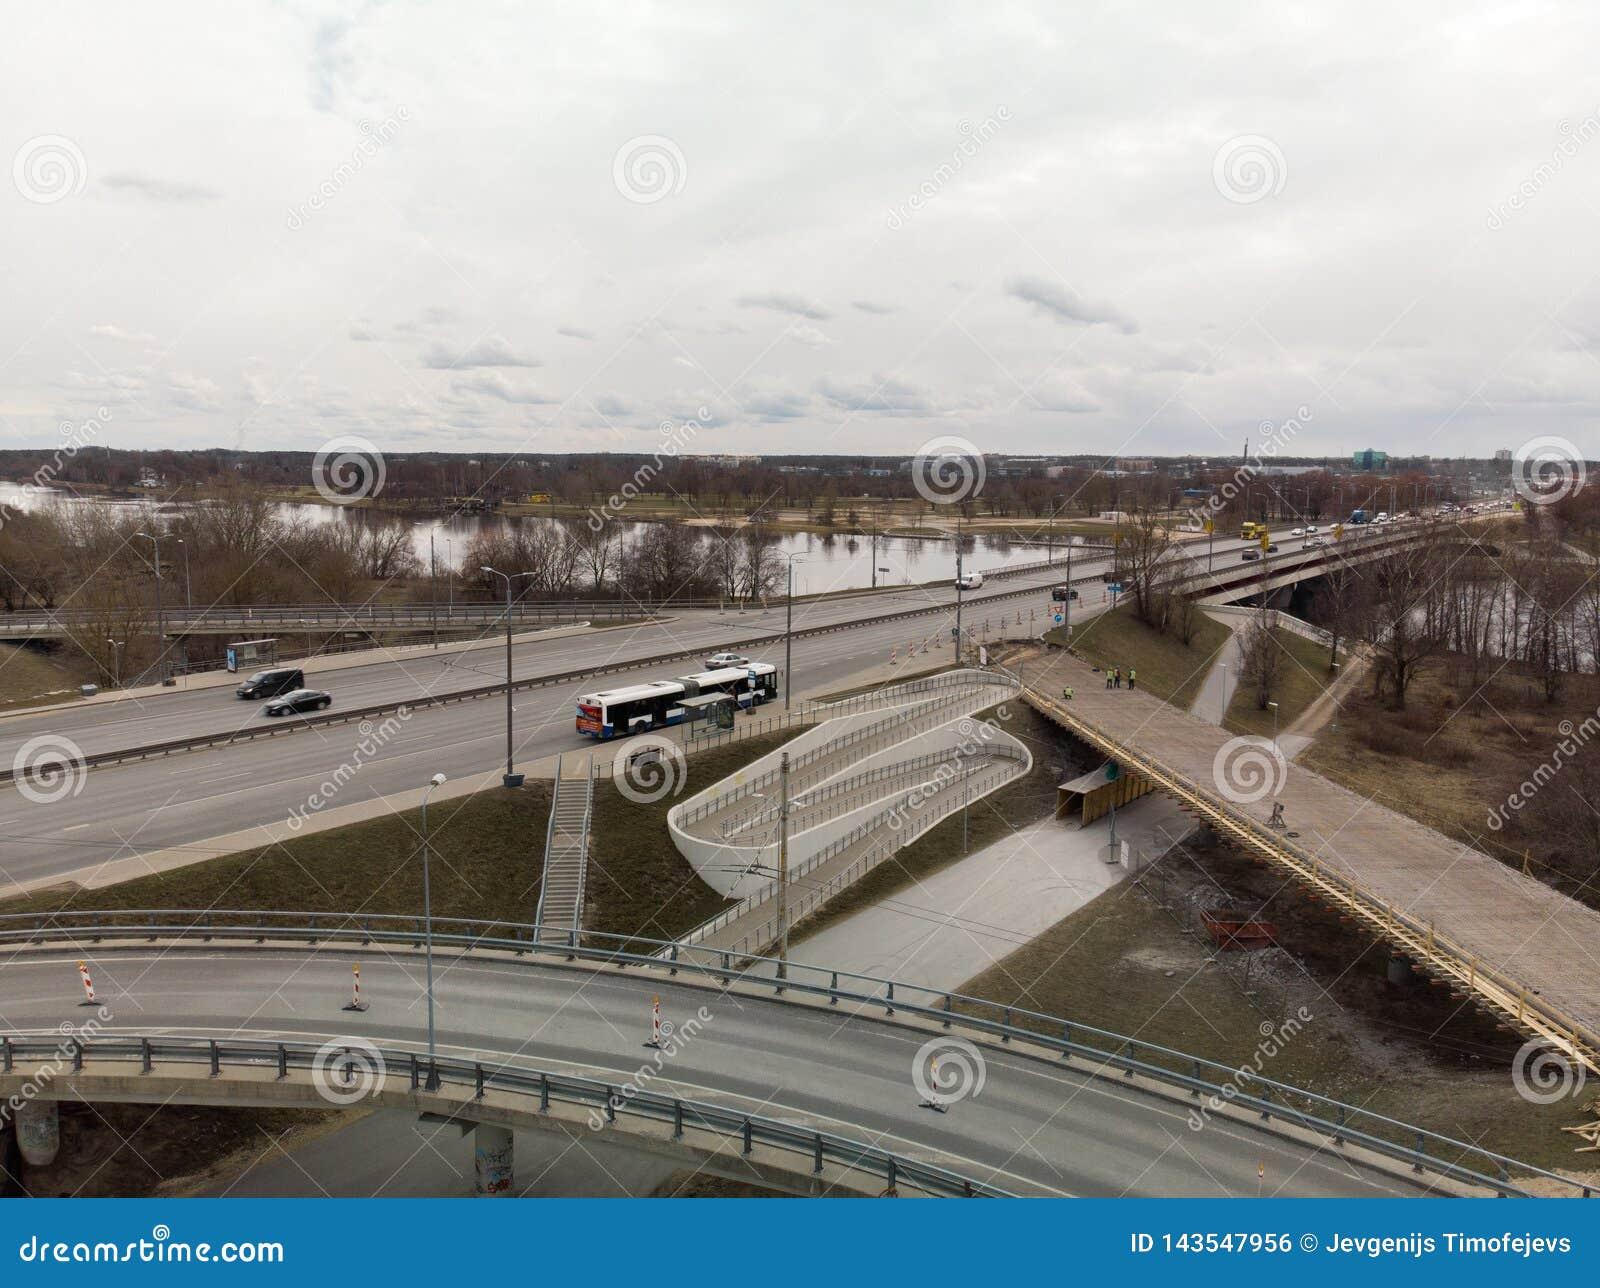 Bridge under construction in Riga, Latvia during a gloomy day